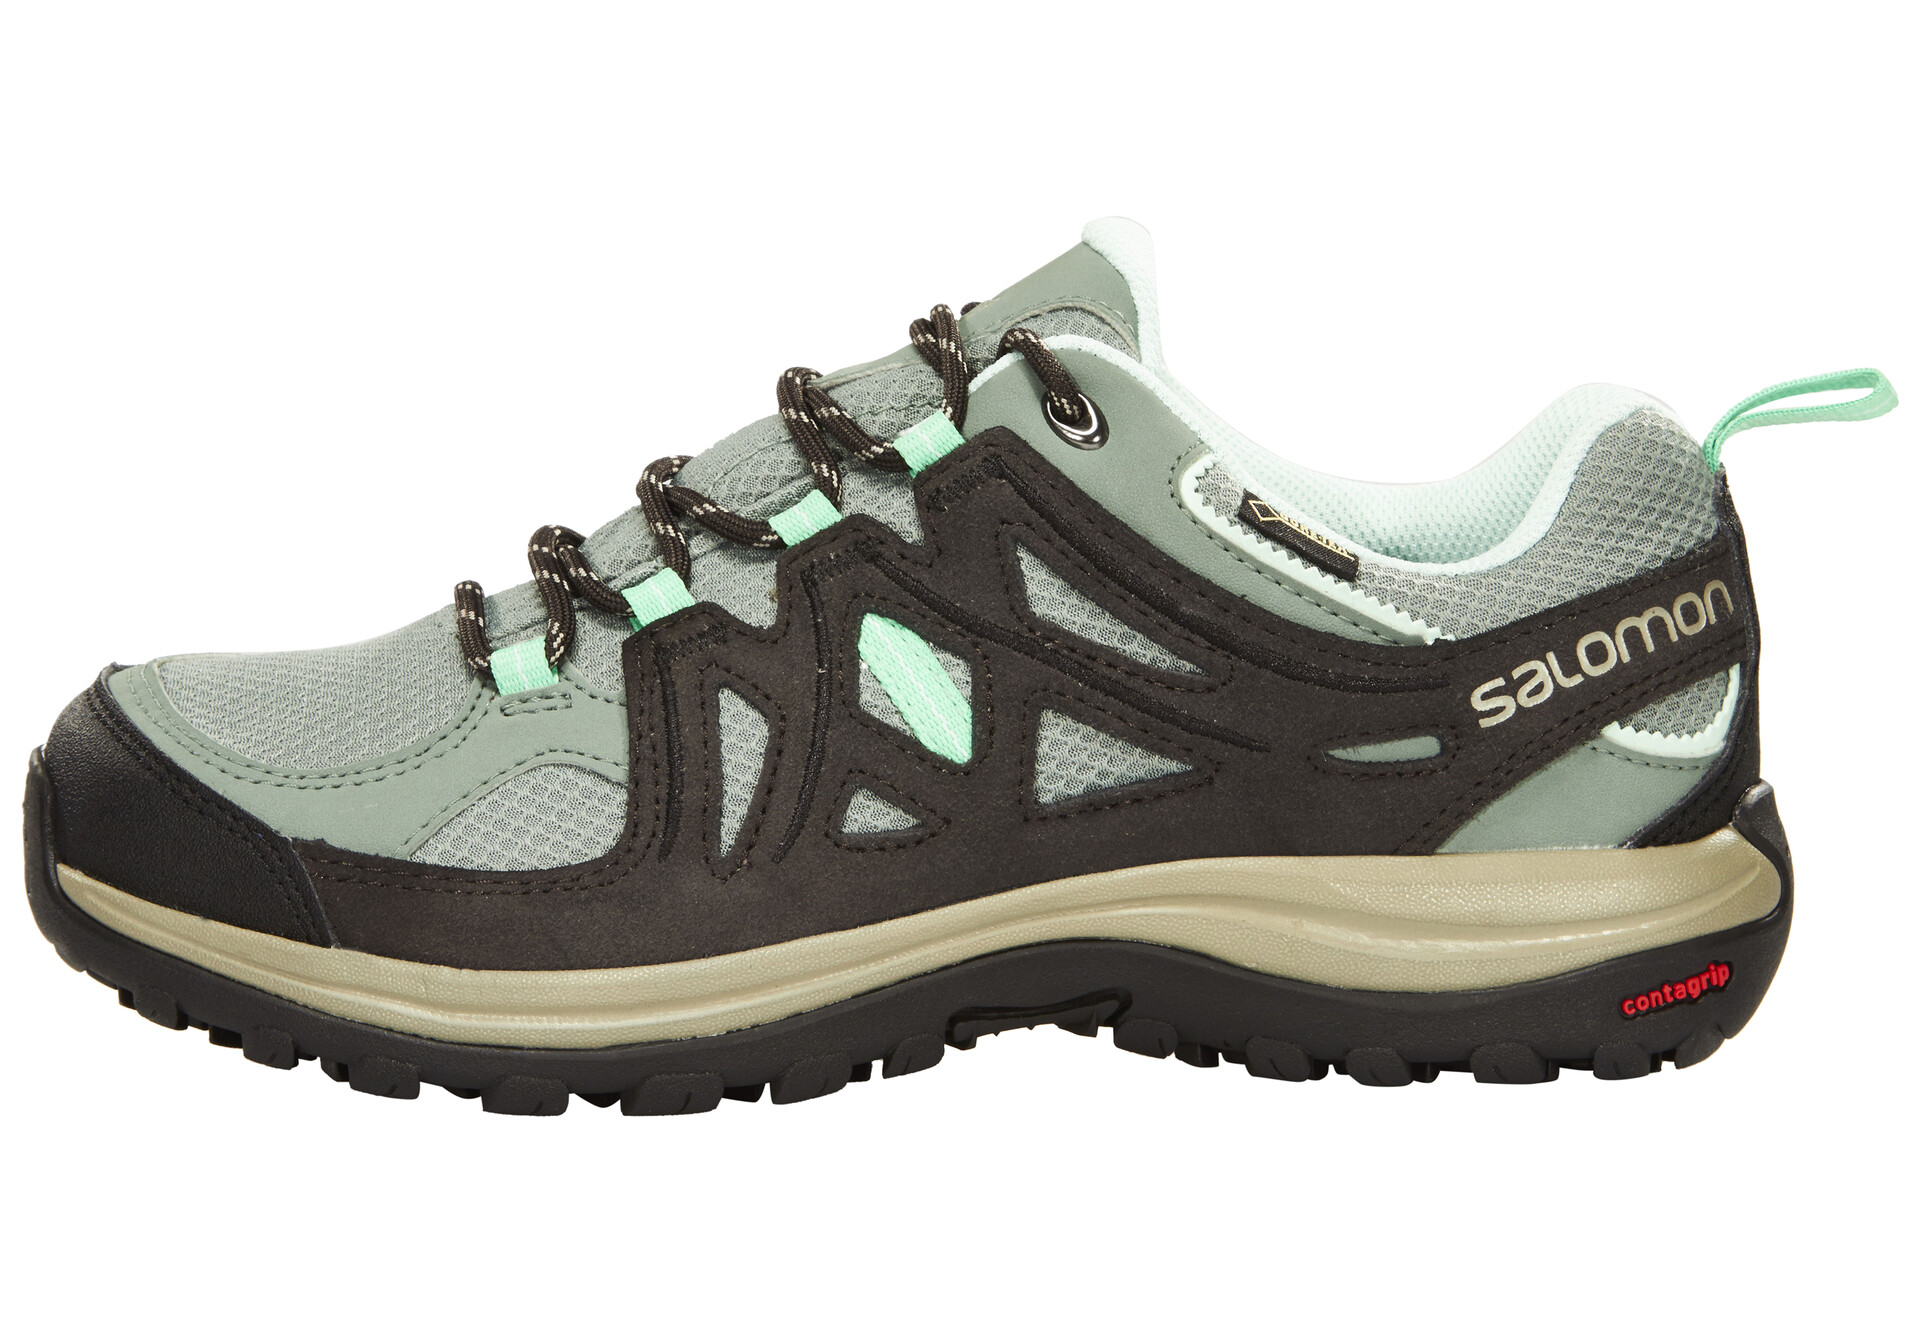 Salomon Ellipse 2 GTX Hiking Shoes Damen light ttasphaltjade green